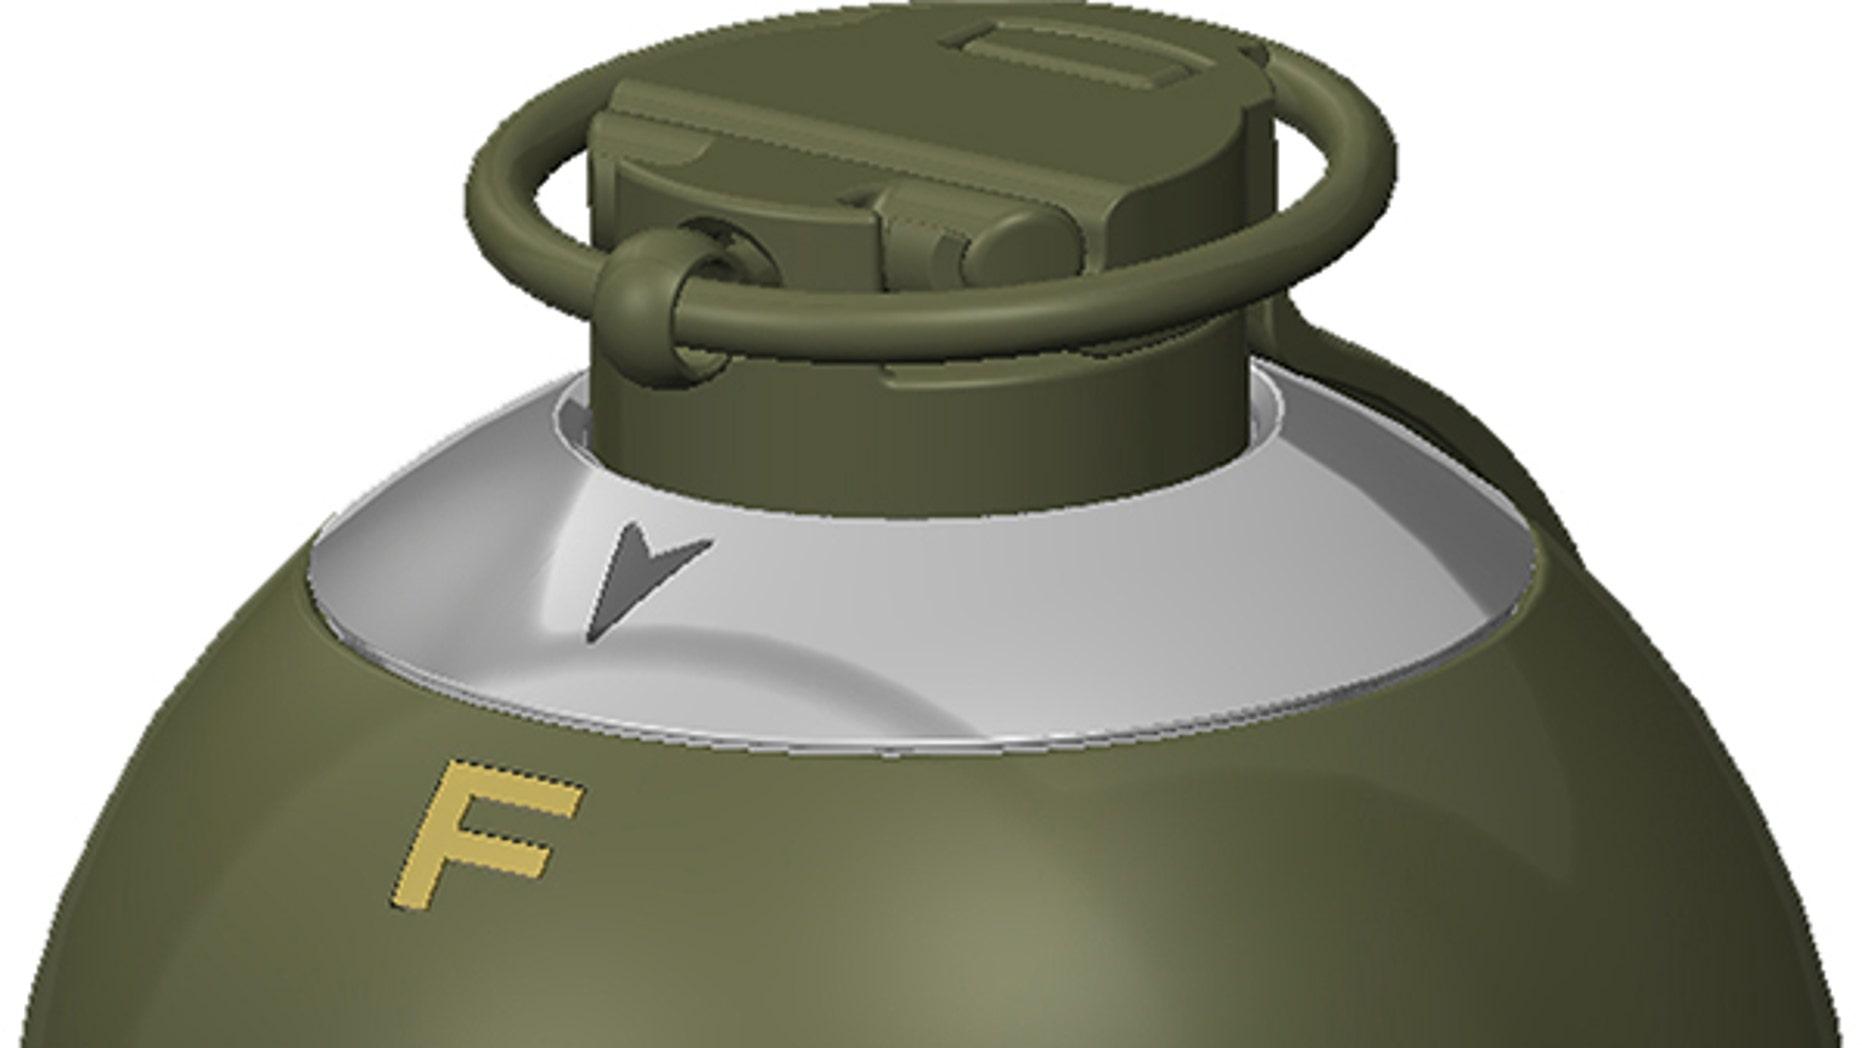 The Enhanced Tactical Multi-Purpose (ET-MP) grenade (U.S. Army).